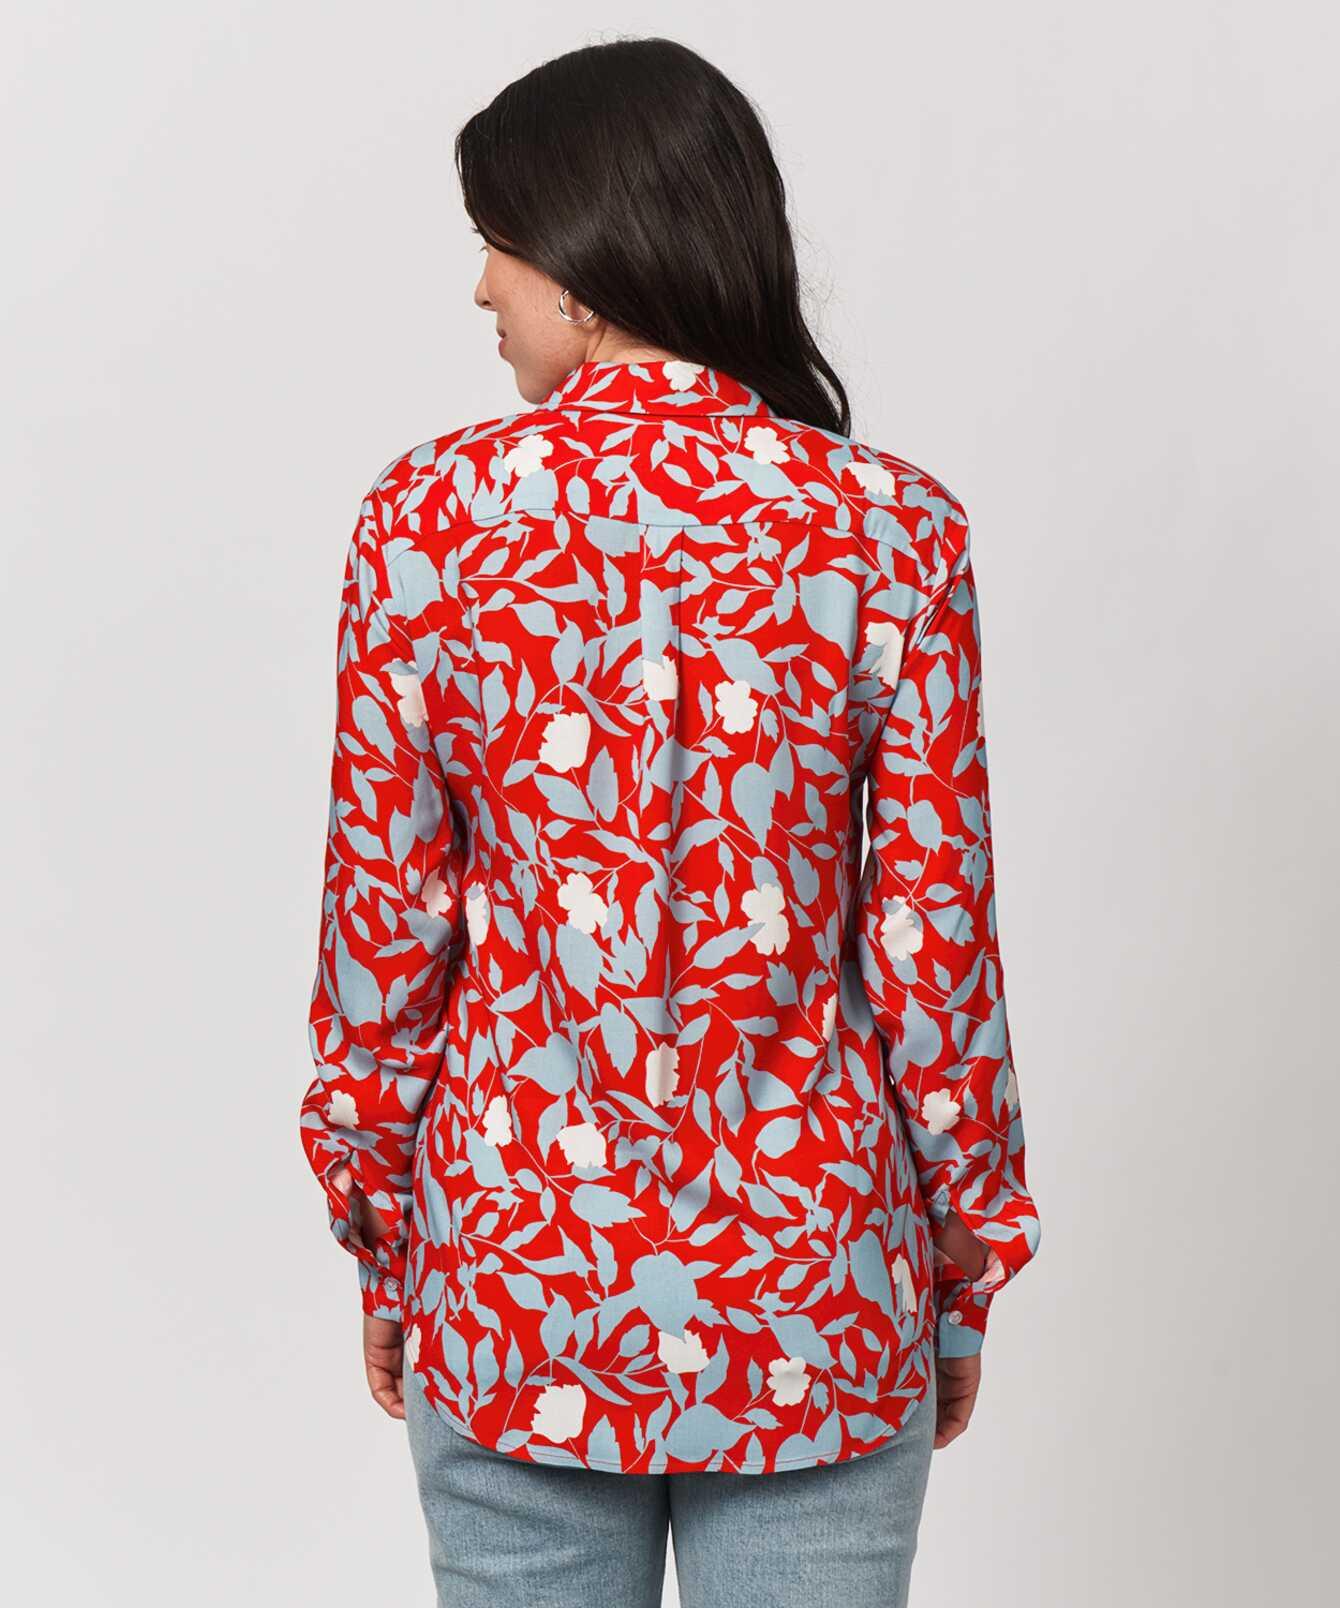 Skjorta Tilde Blush The Shirt Factory